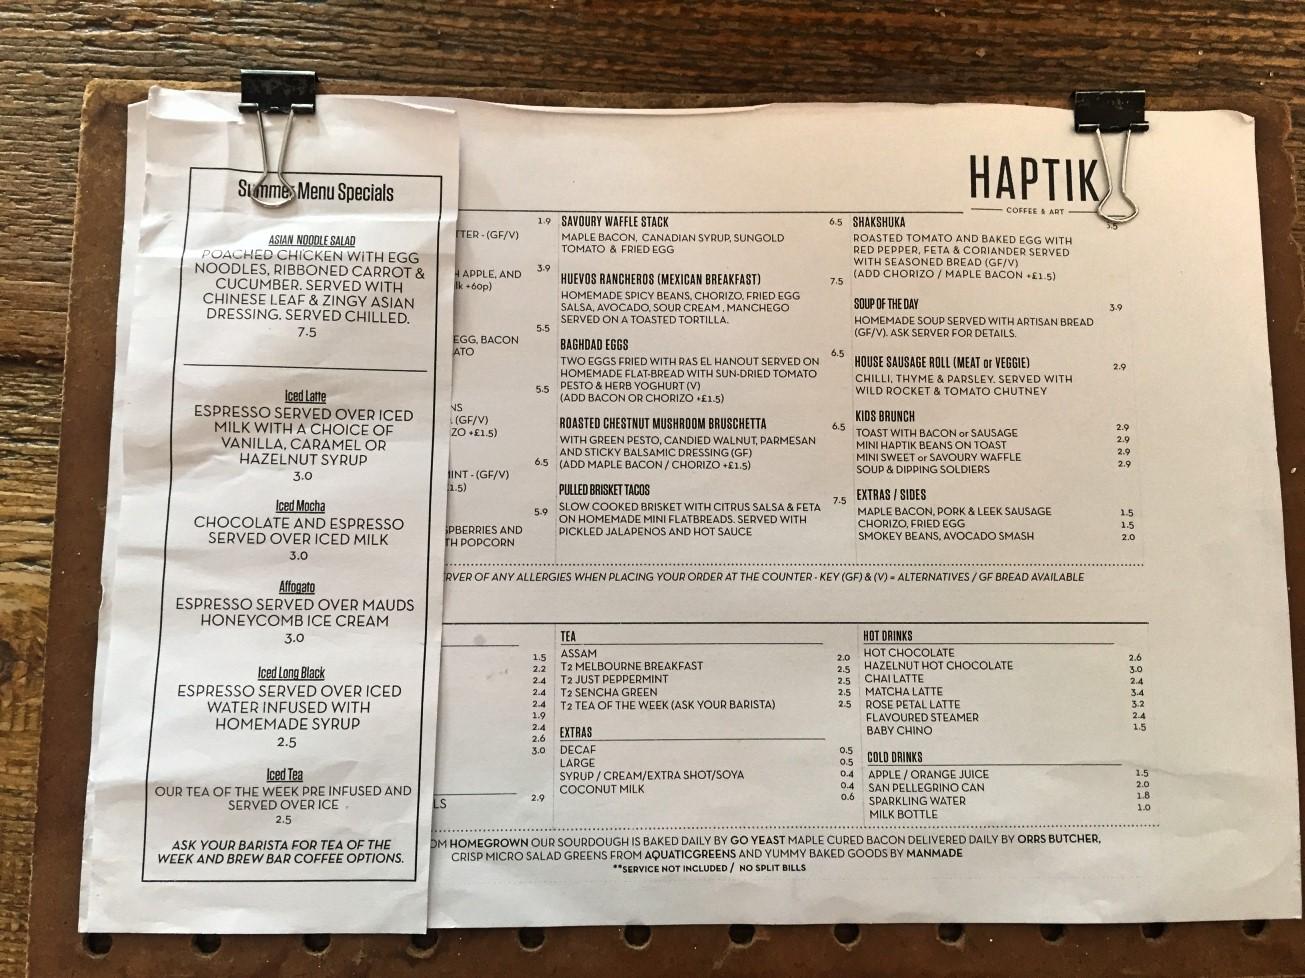 haptik_coffee_menu_newtownards_NI_explorer